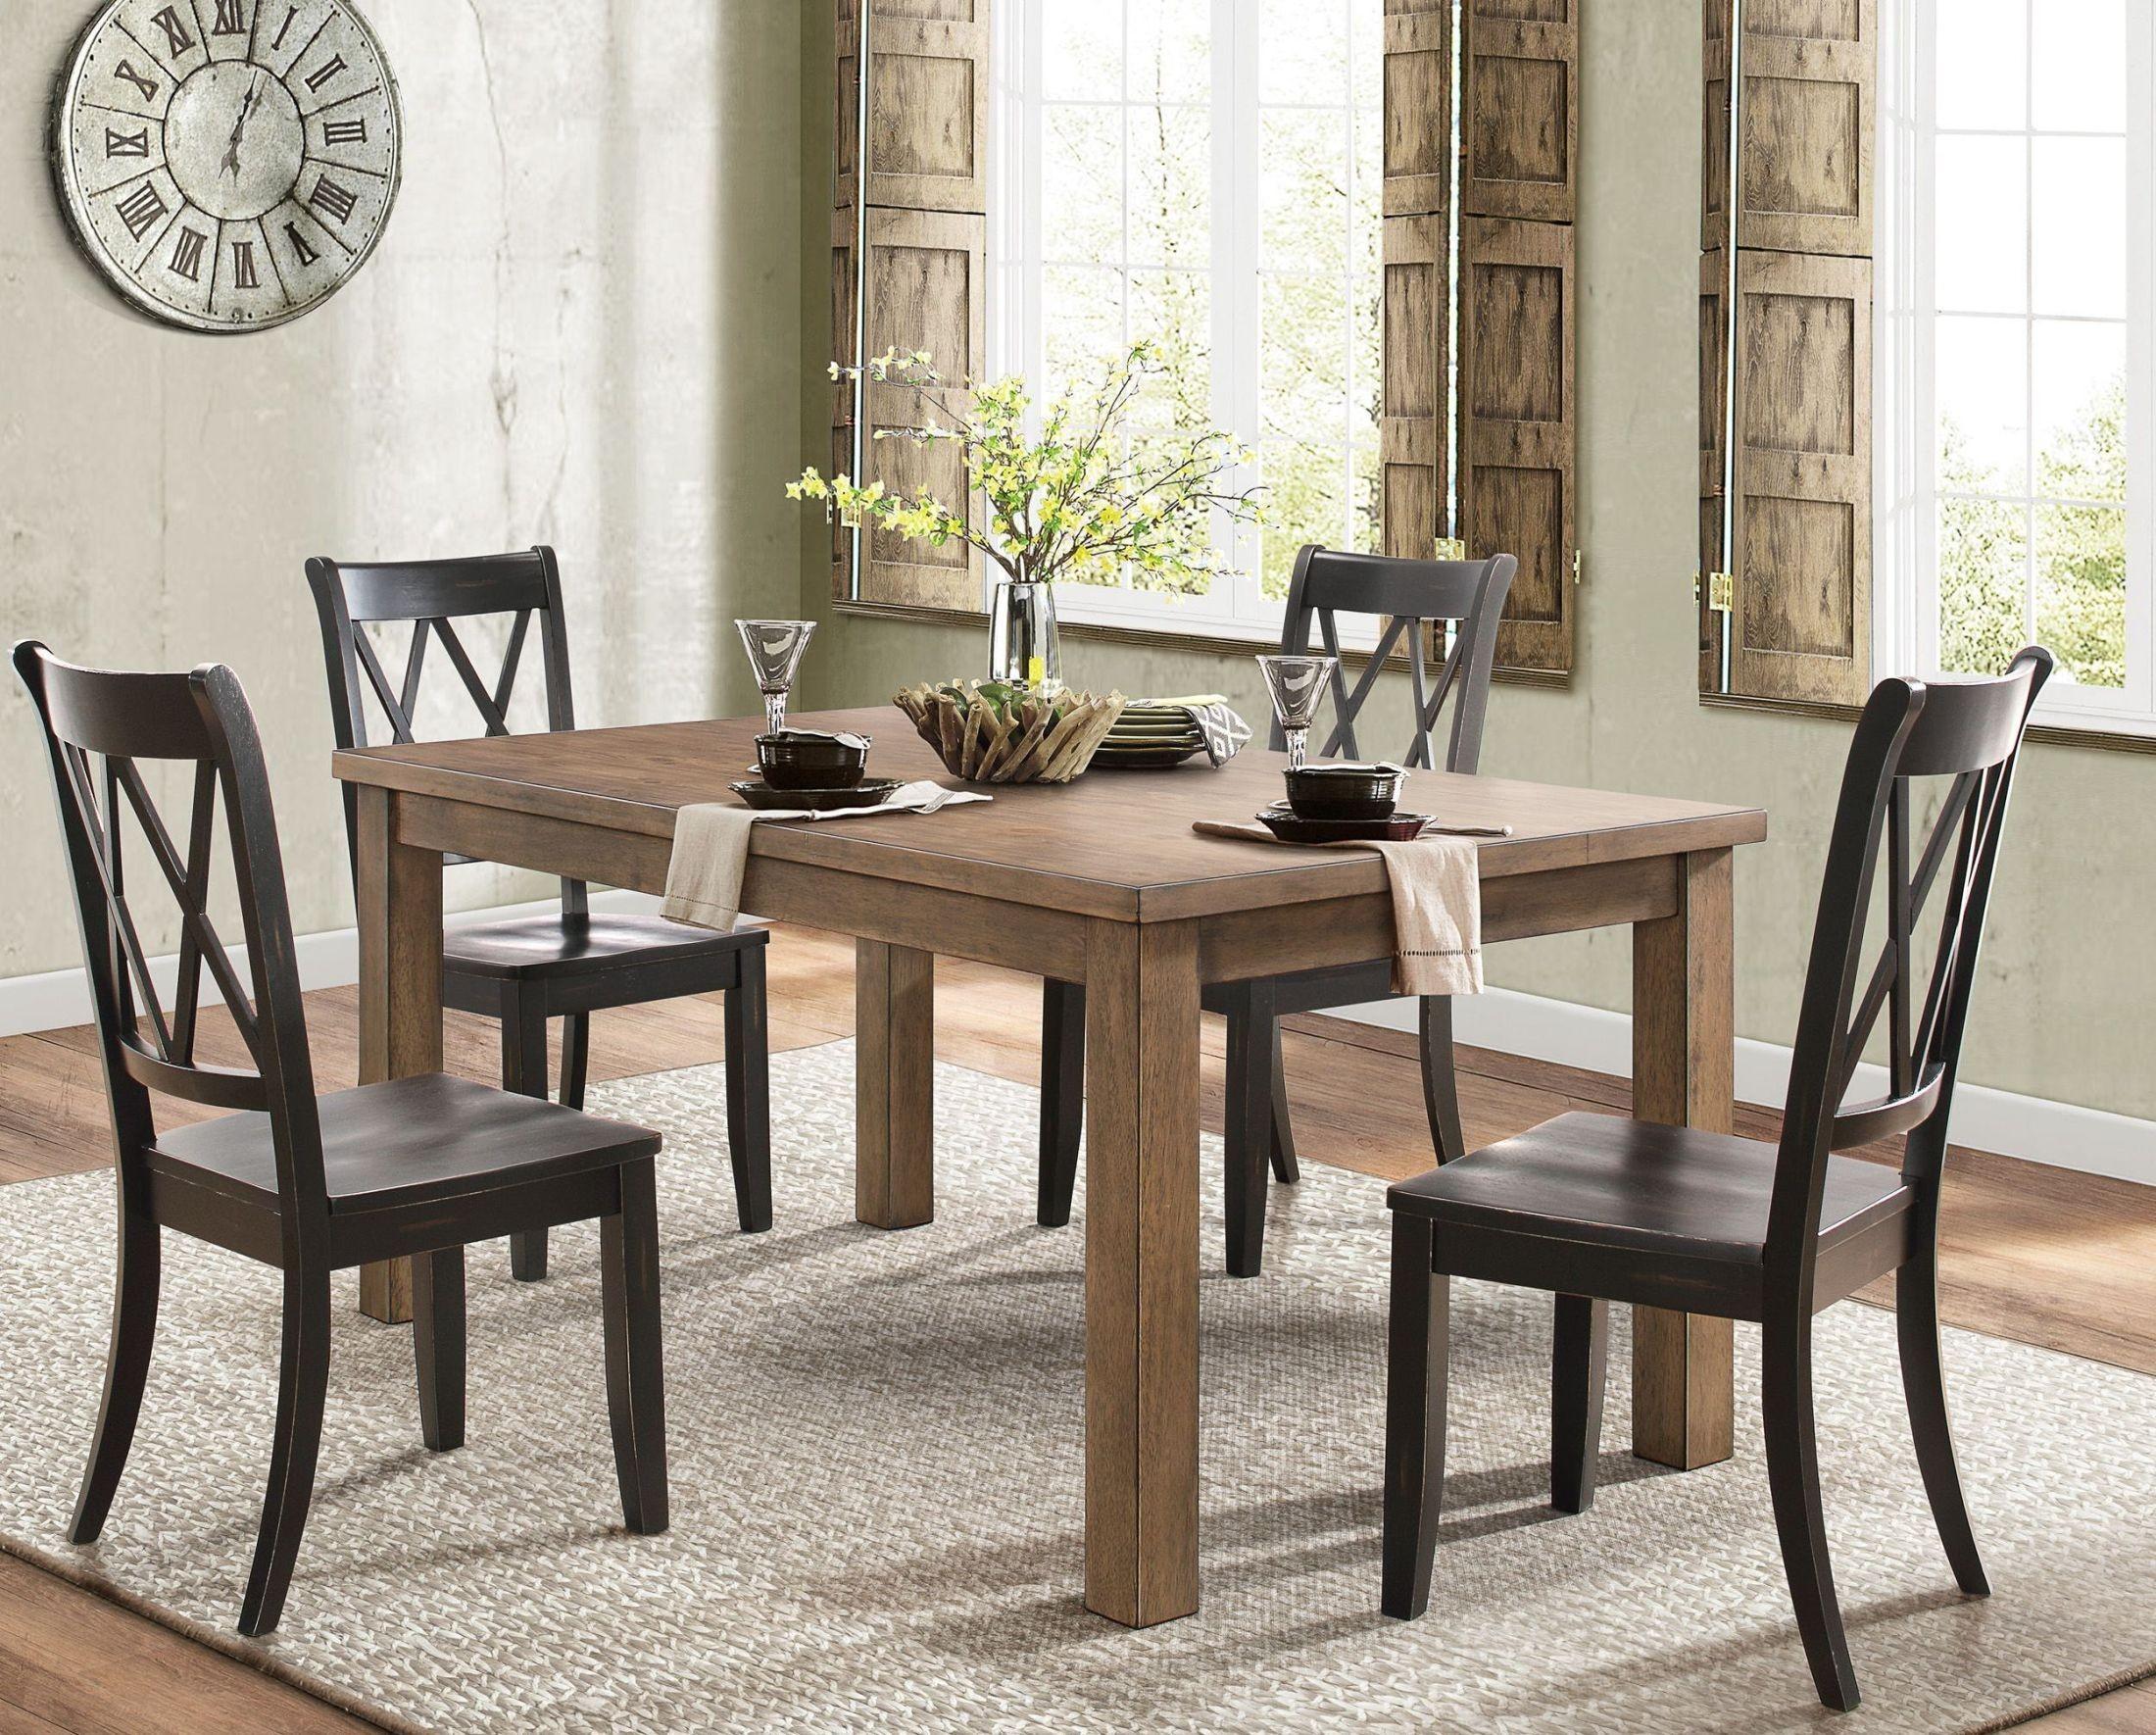 Pine dining room